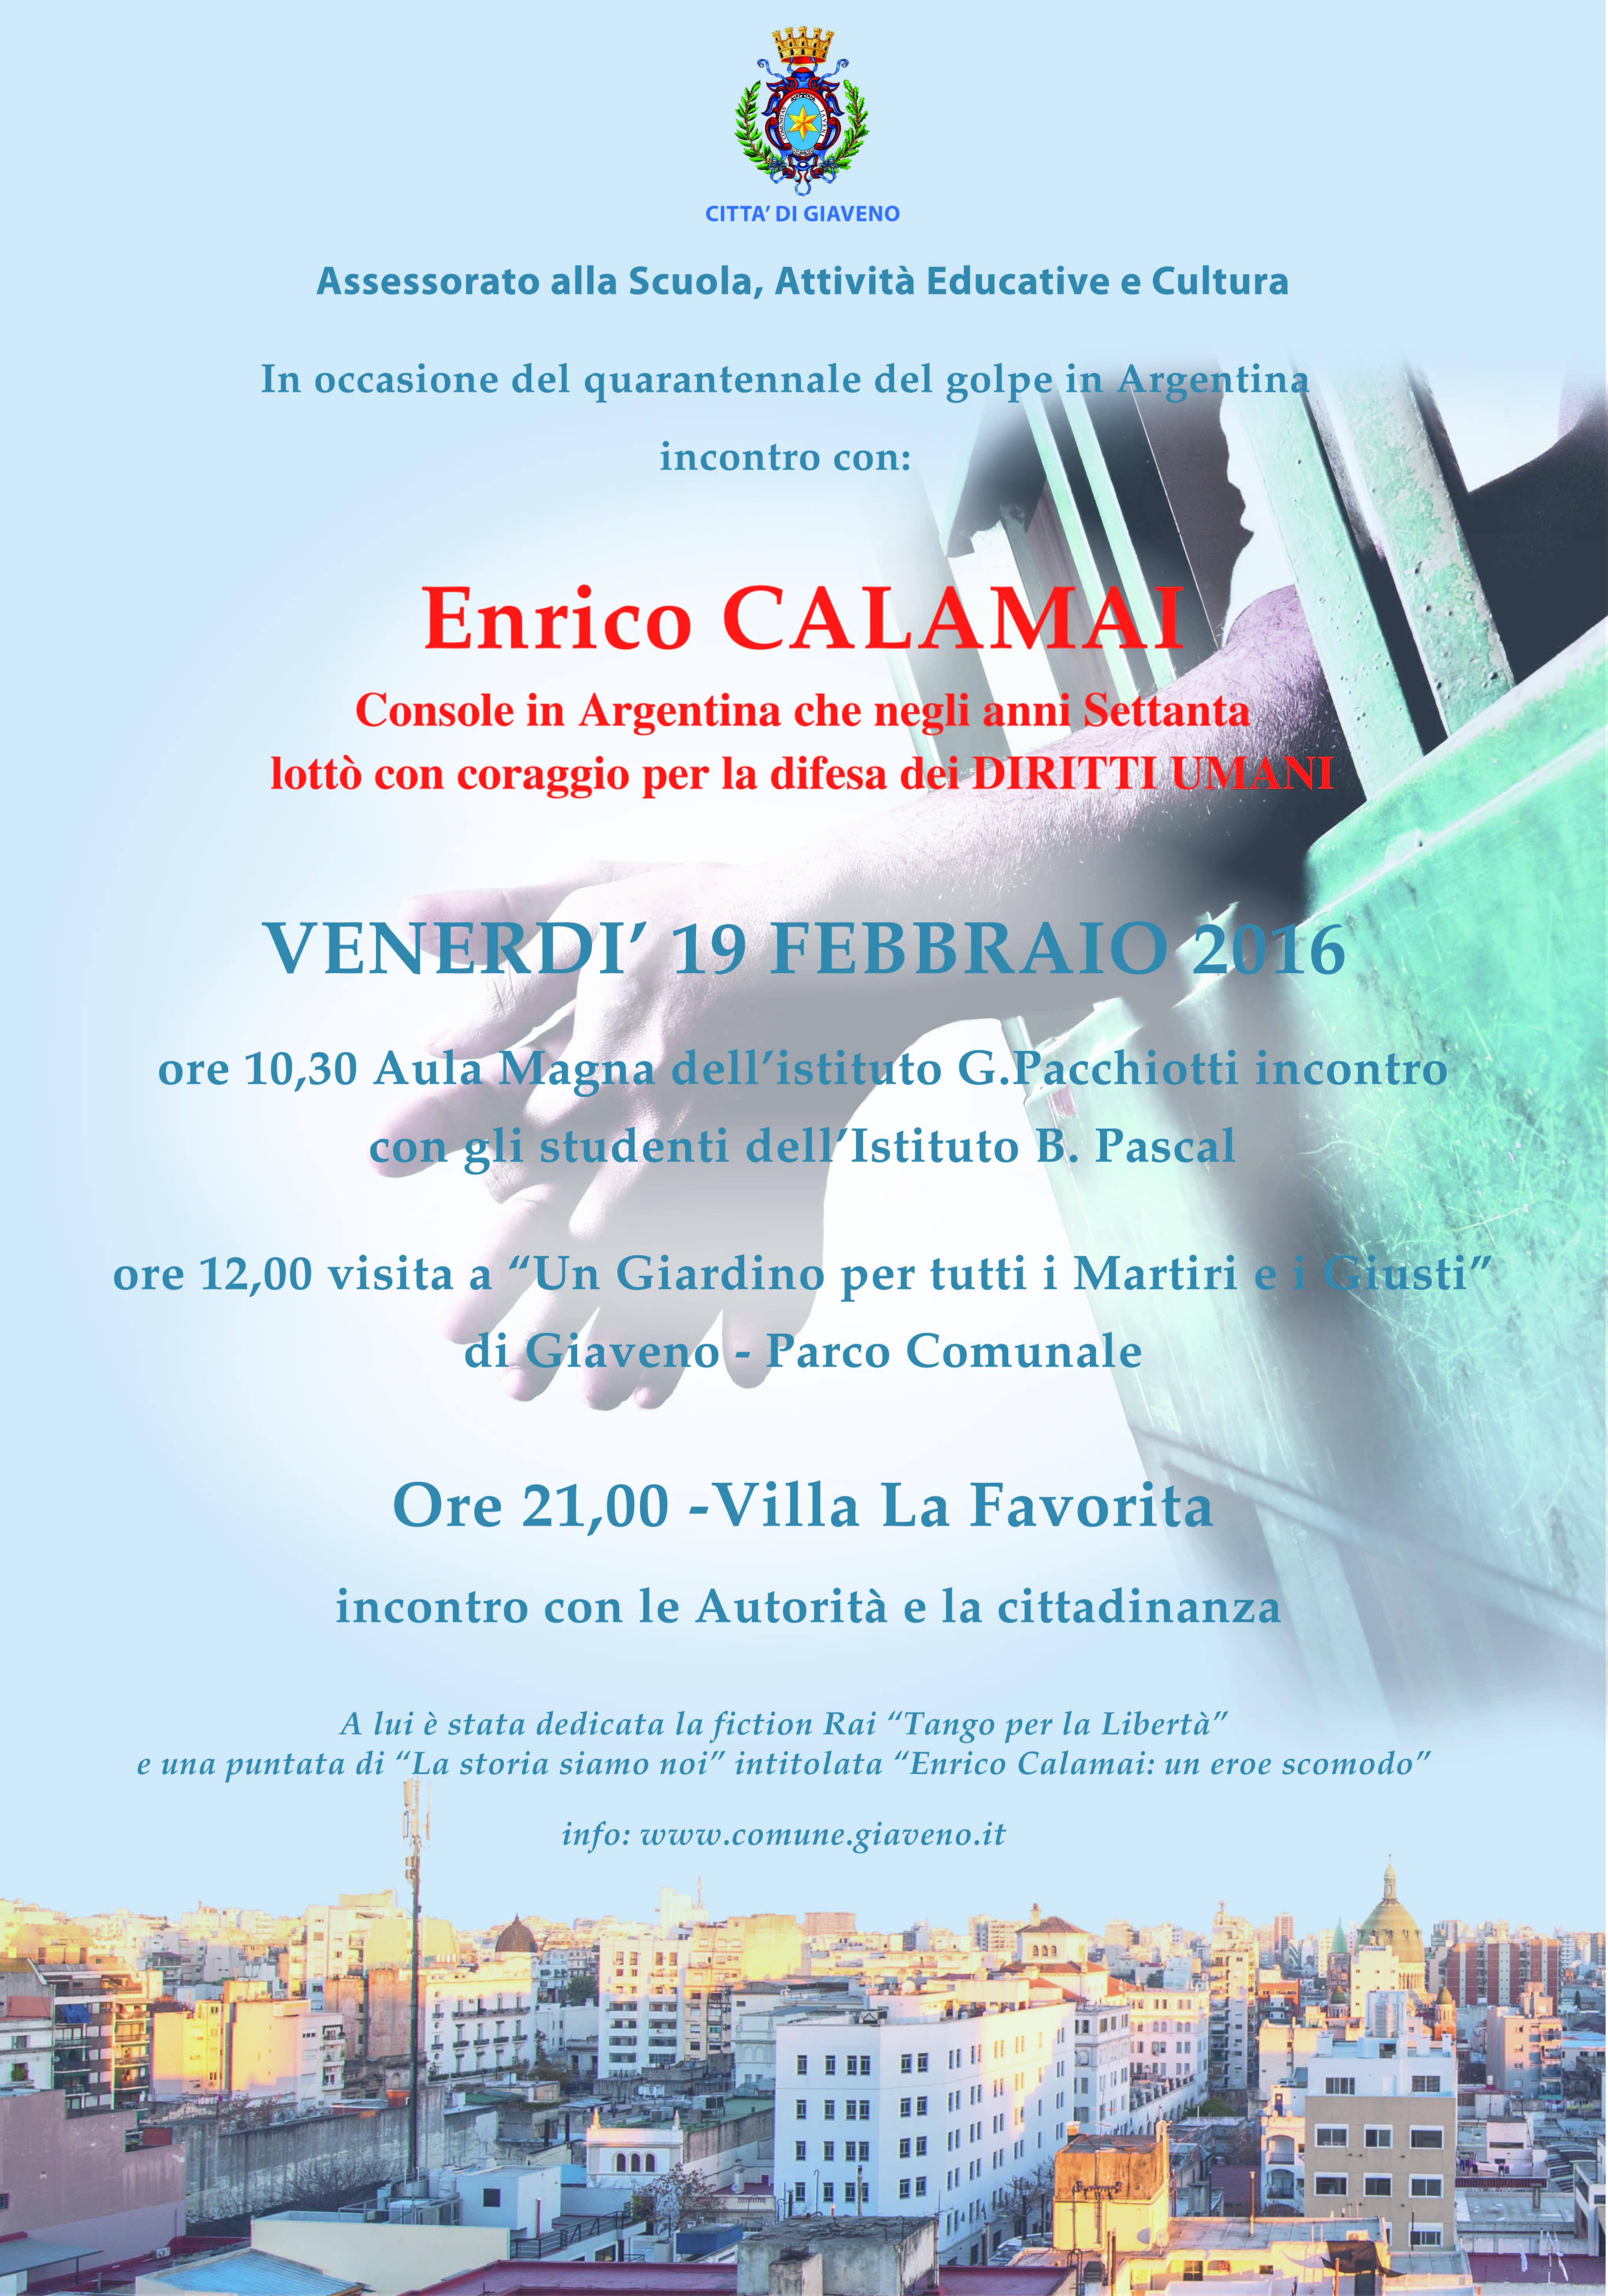 Enrico Calamai a Giaveno  – Venerdì 19 febbraio 2016